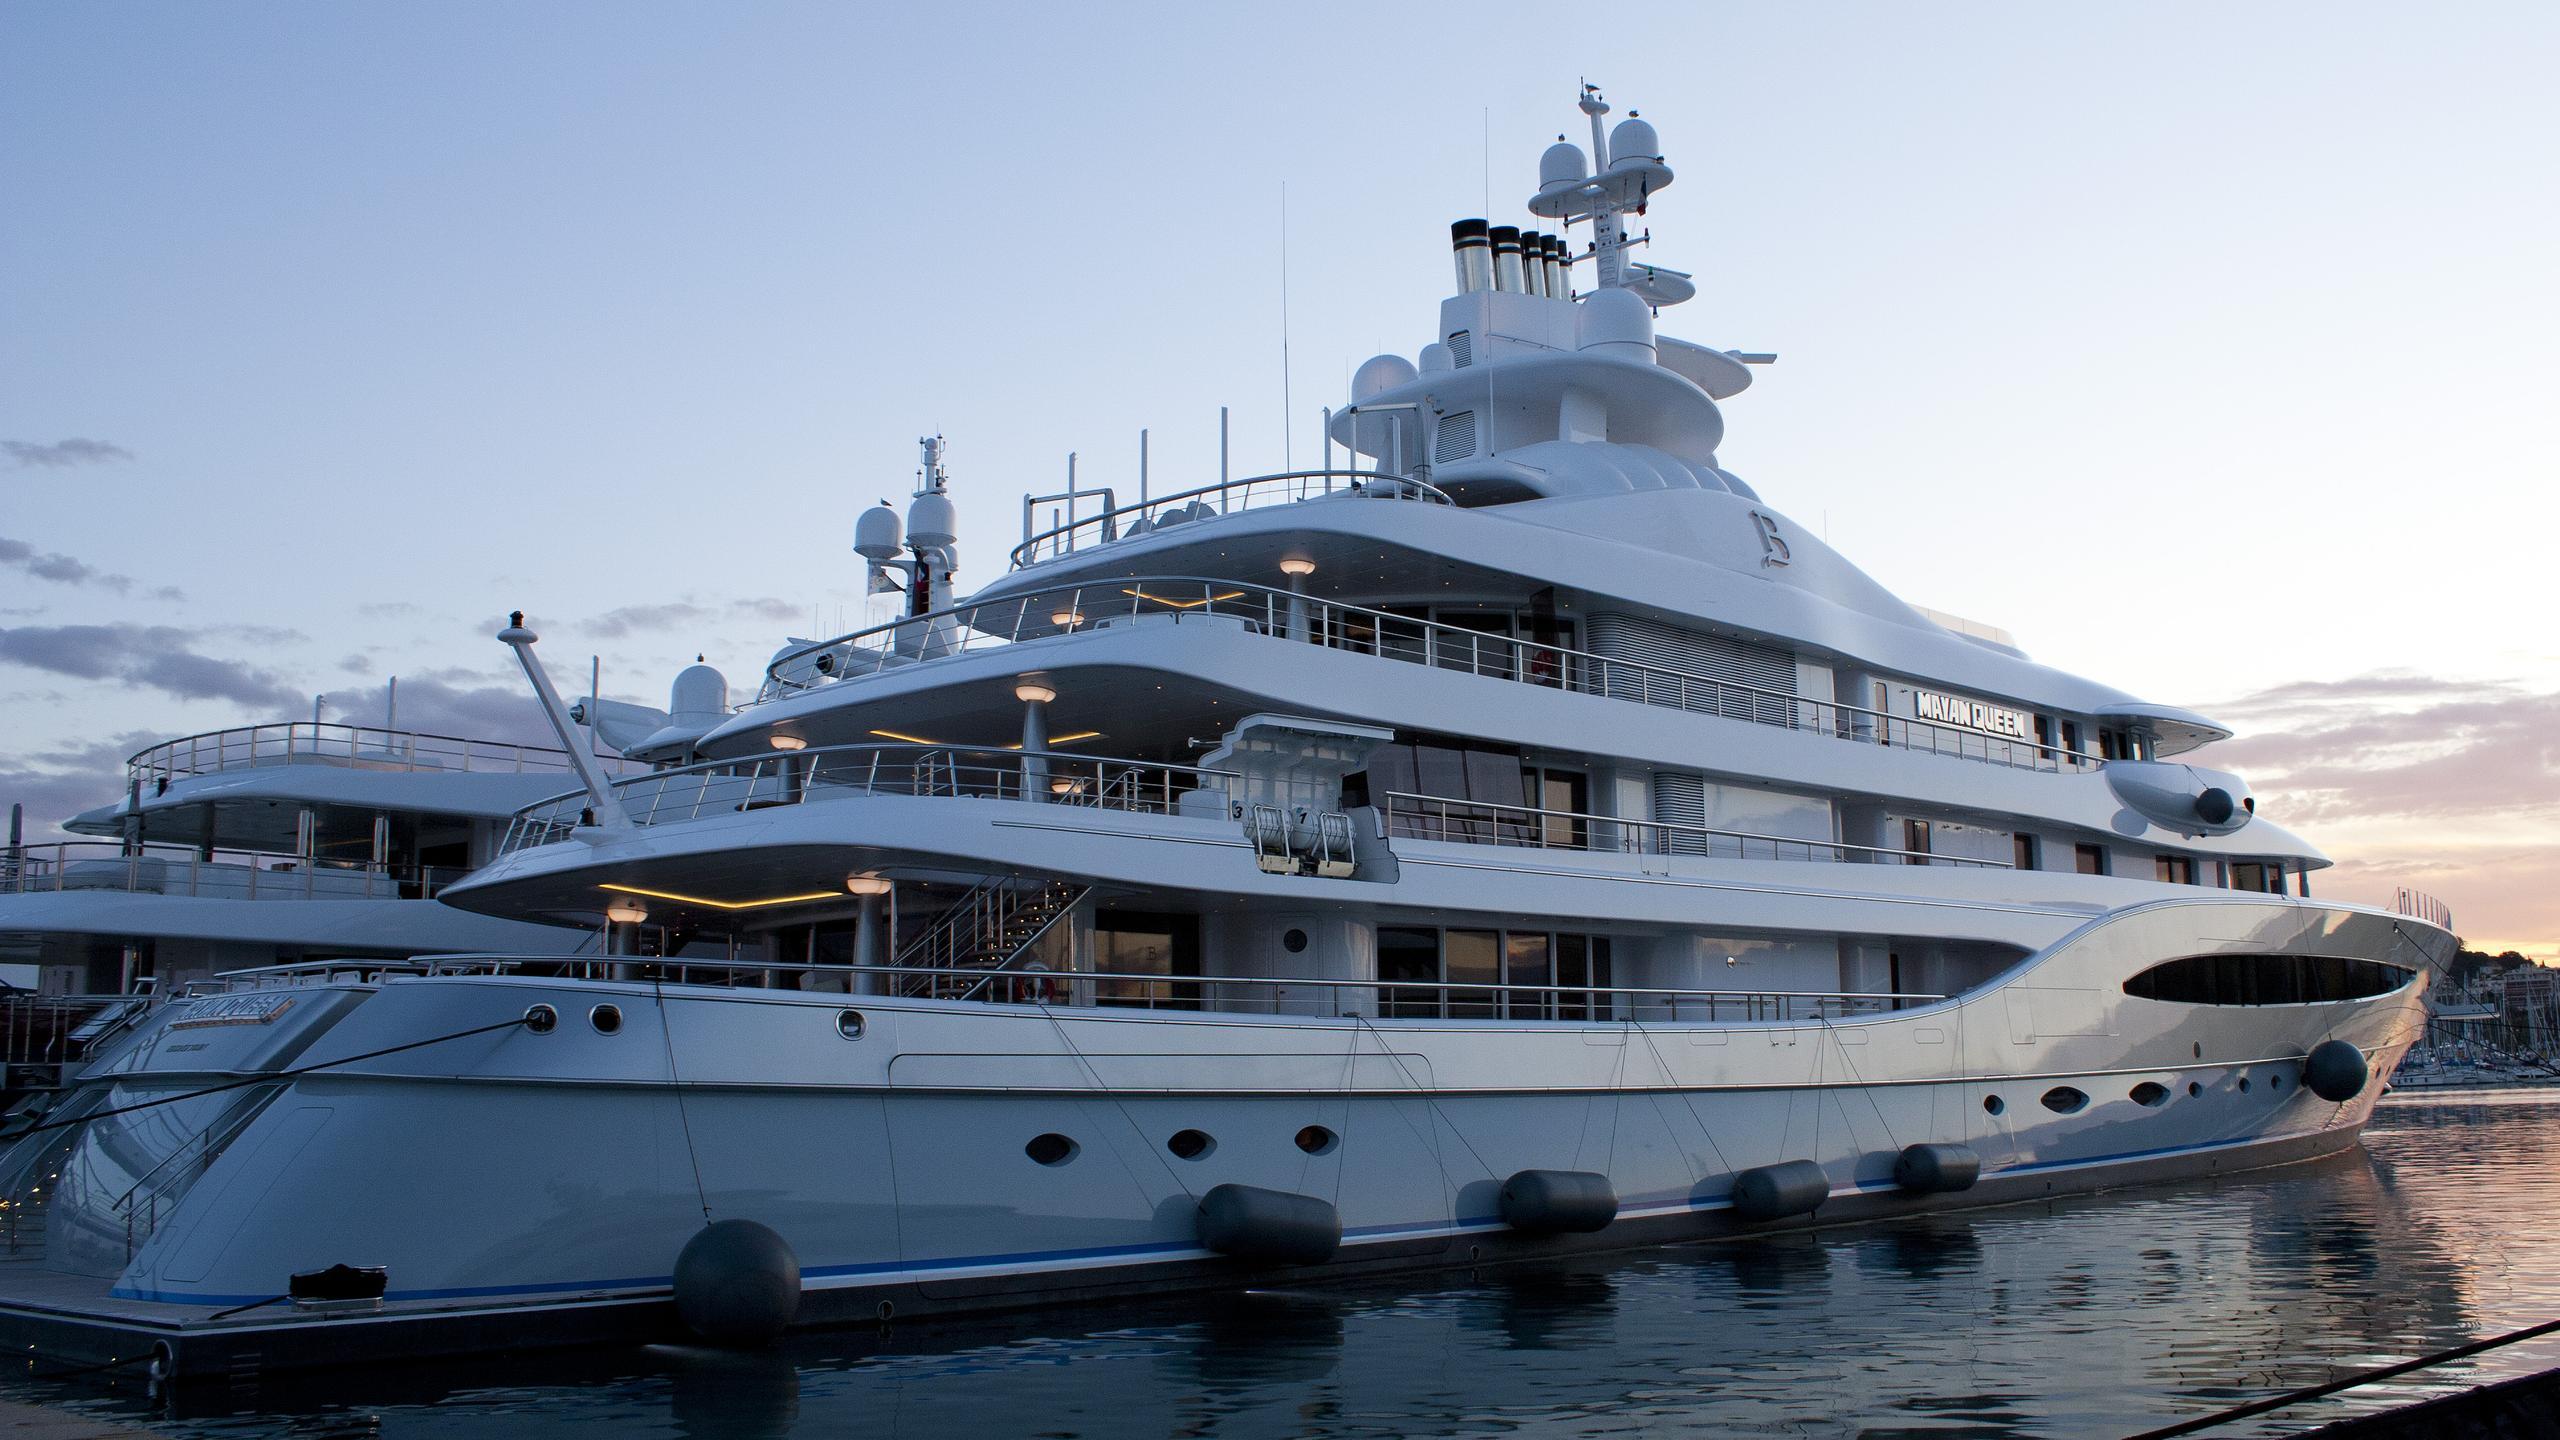 mayan-queen-iv-motor-yacht-blohm-voss-2008-93m-half-profile